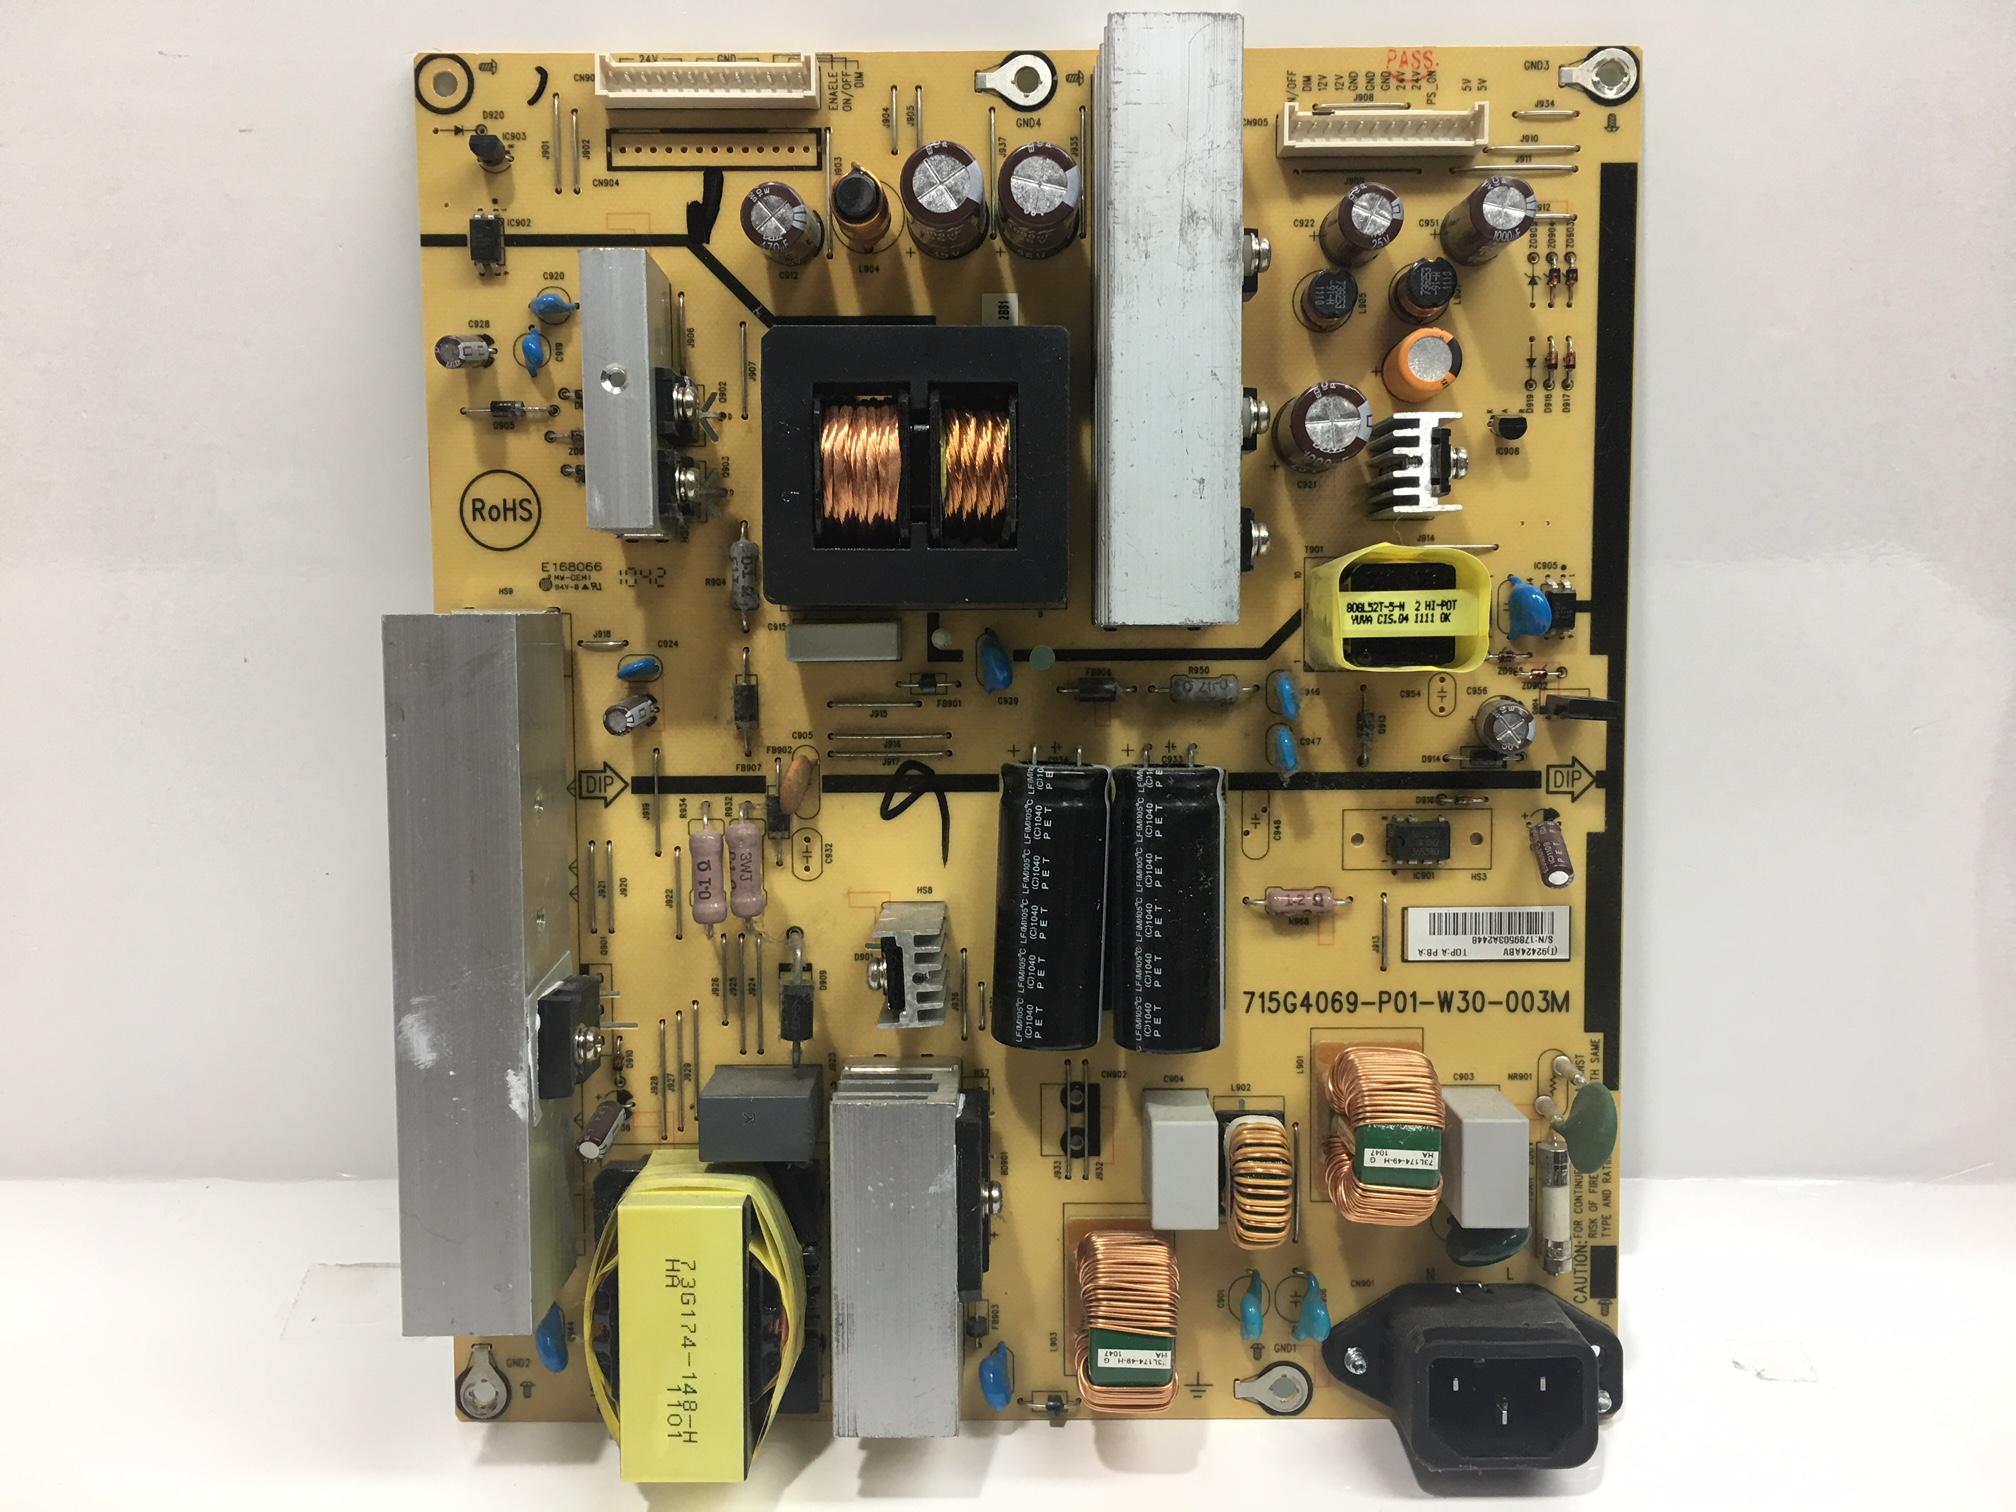 Vizio ADTV92424ABV Power Supply for E470VA / E470VL